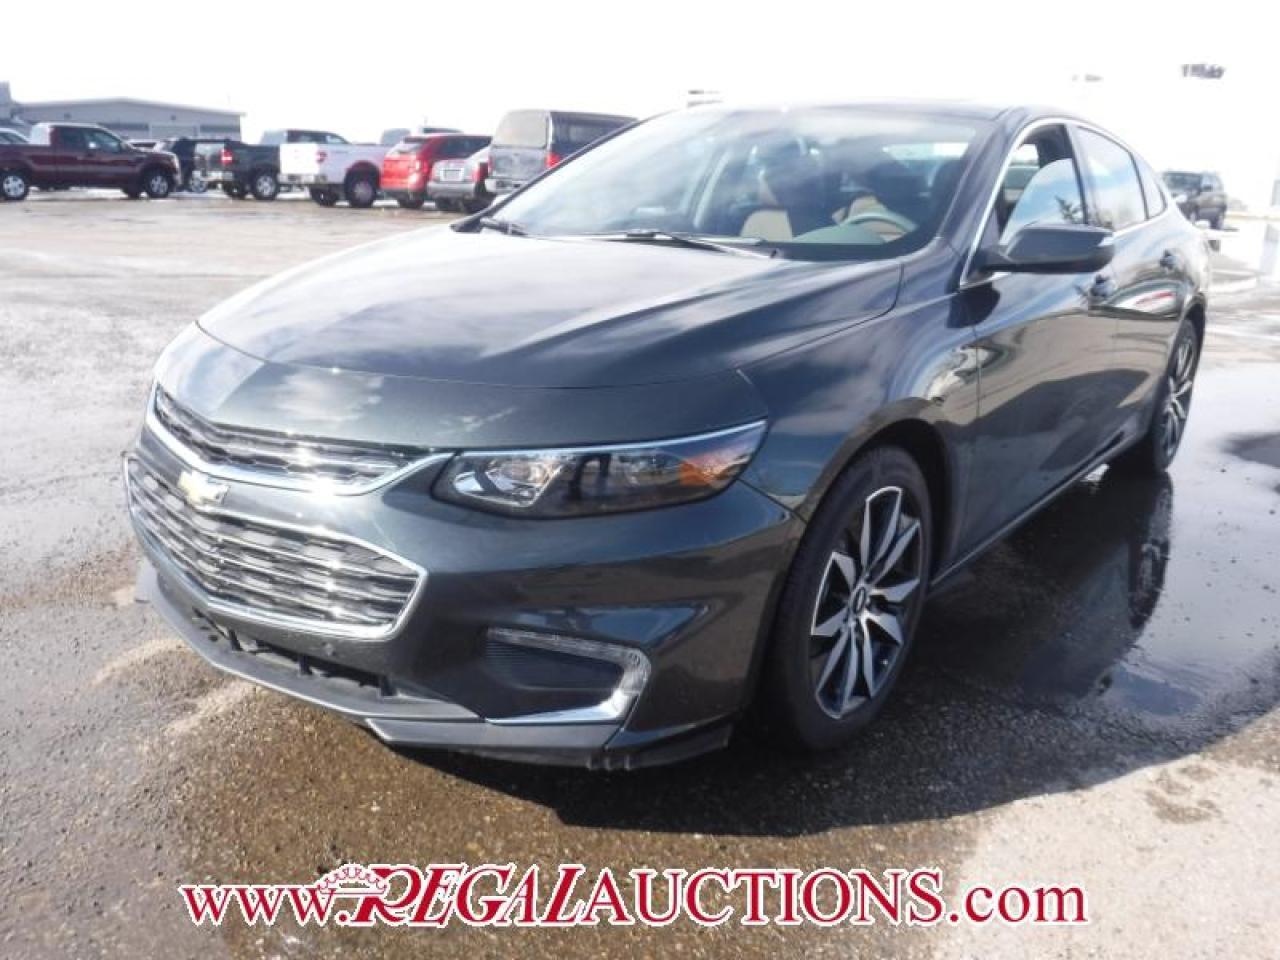 Photo of Grey 2017 Chevrolet MALIBU LT 4D SEDAN 1.5L